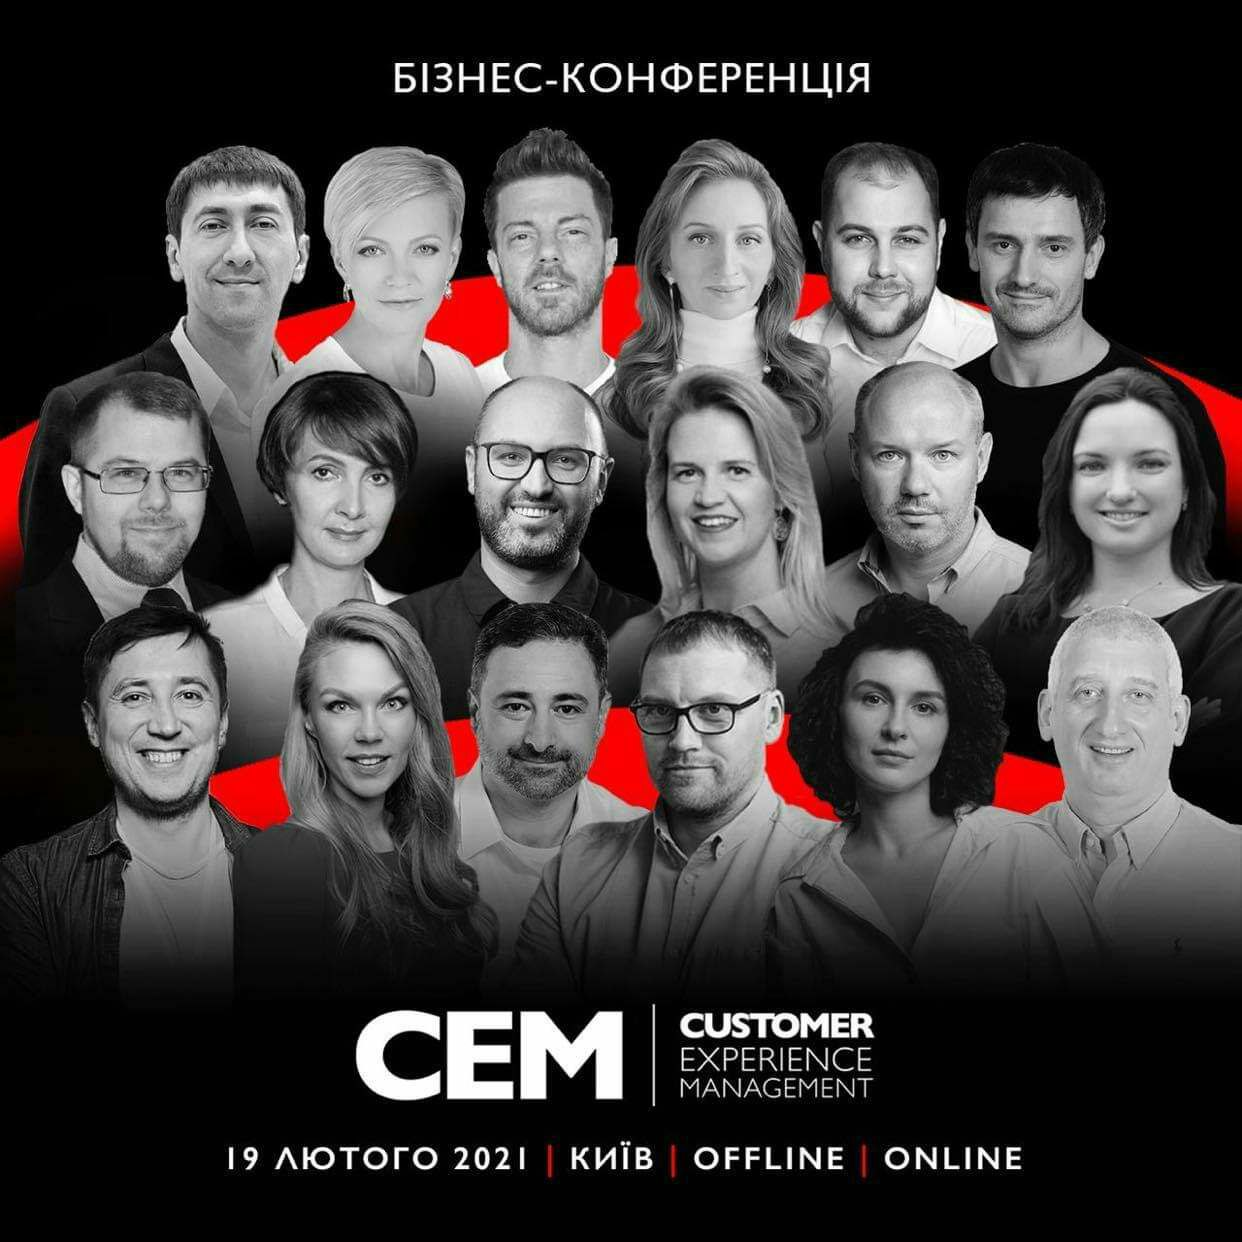 Сustomer Experience Management: код першокласного сервісу. 19 лютого 2021, Київ